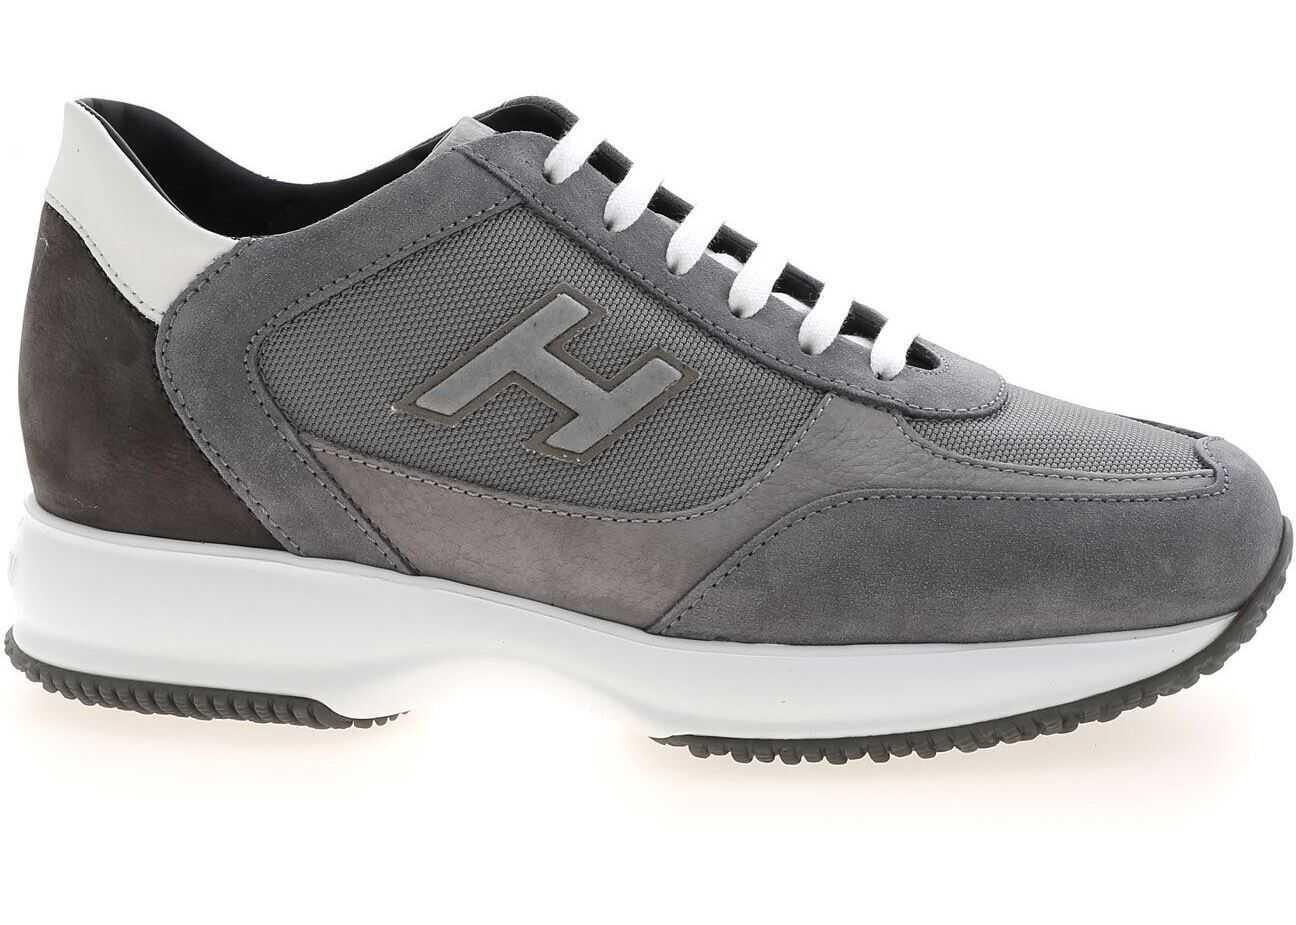 Hogan Interactive Sneakers In Grey HXM00N0Q101PDU647L Grey imagine b-mall.ro